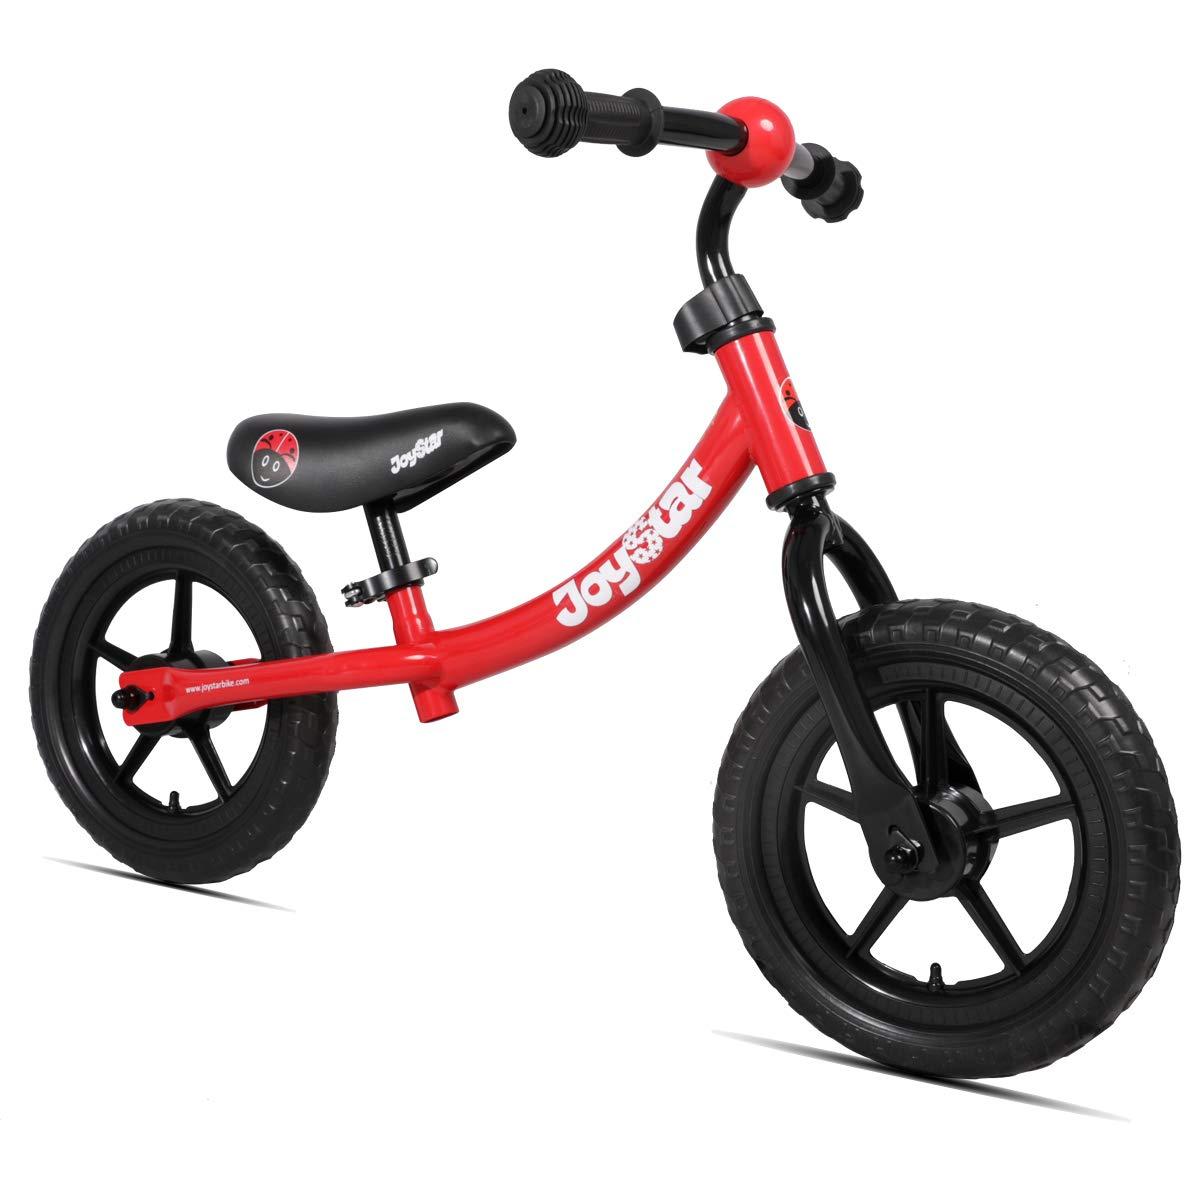 JOYSTAR Balance Bike for 1 2 3 4 5 Years Old Boys & Girls, Neutral Toddler Push Bike for Child, 12 inch Kids Glider Bike, Red